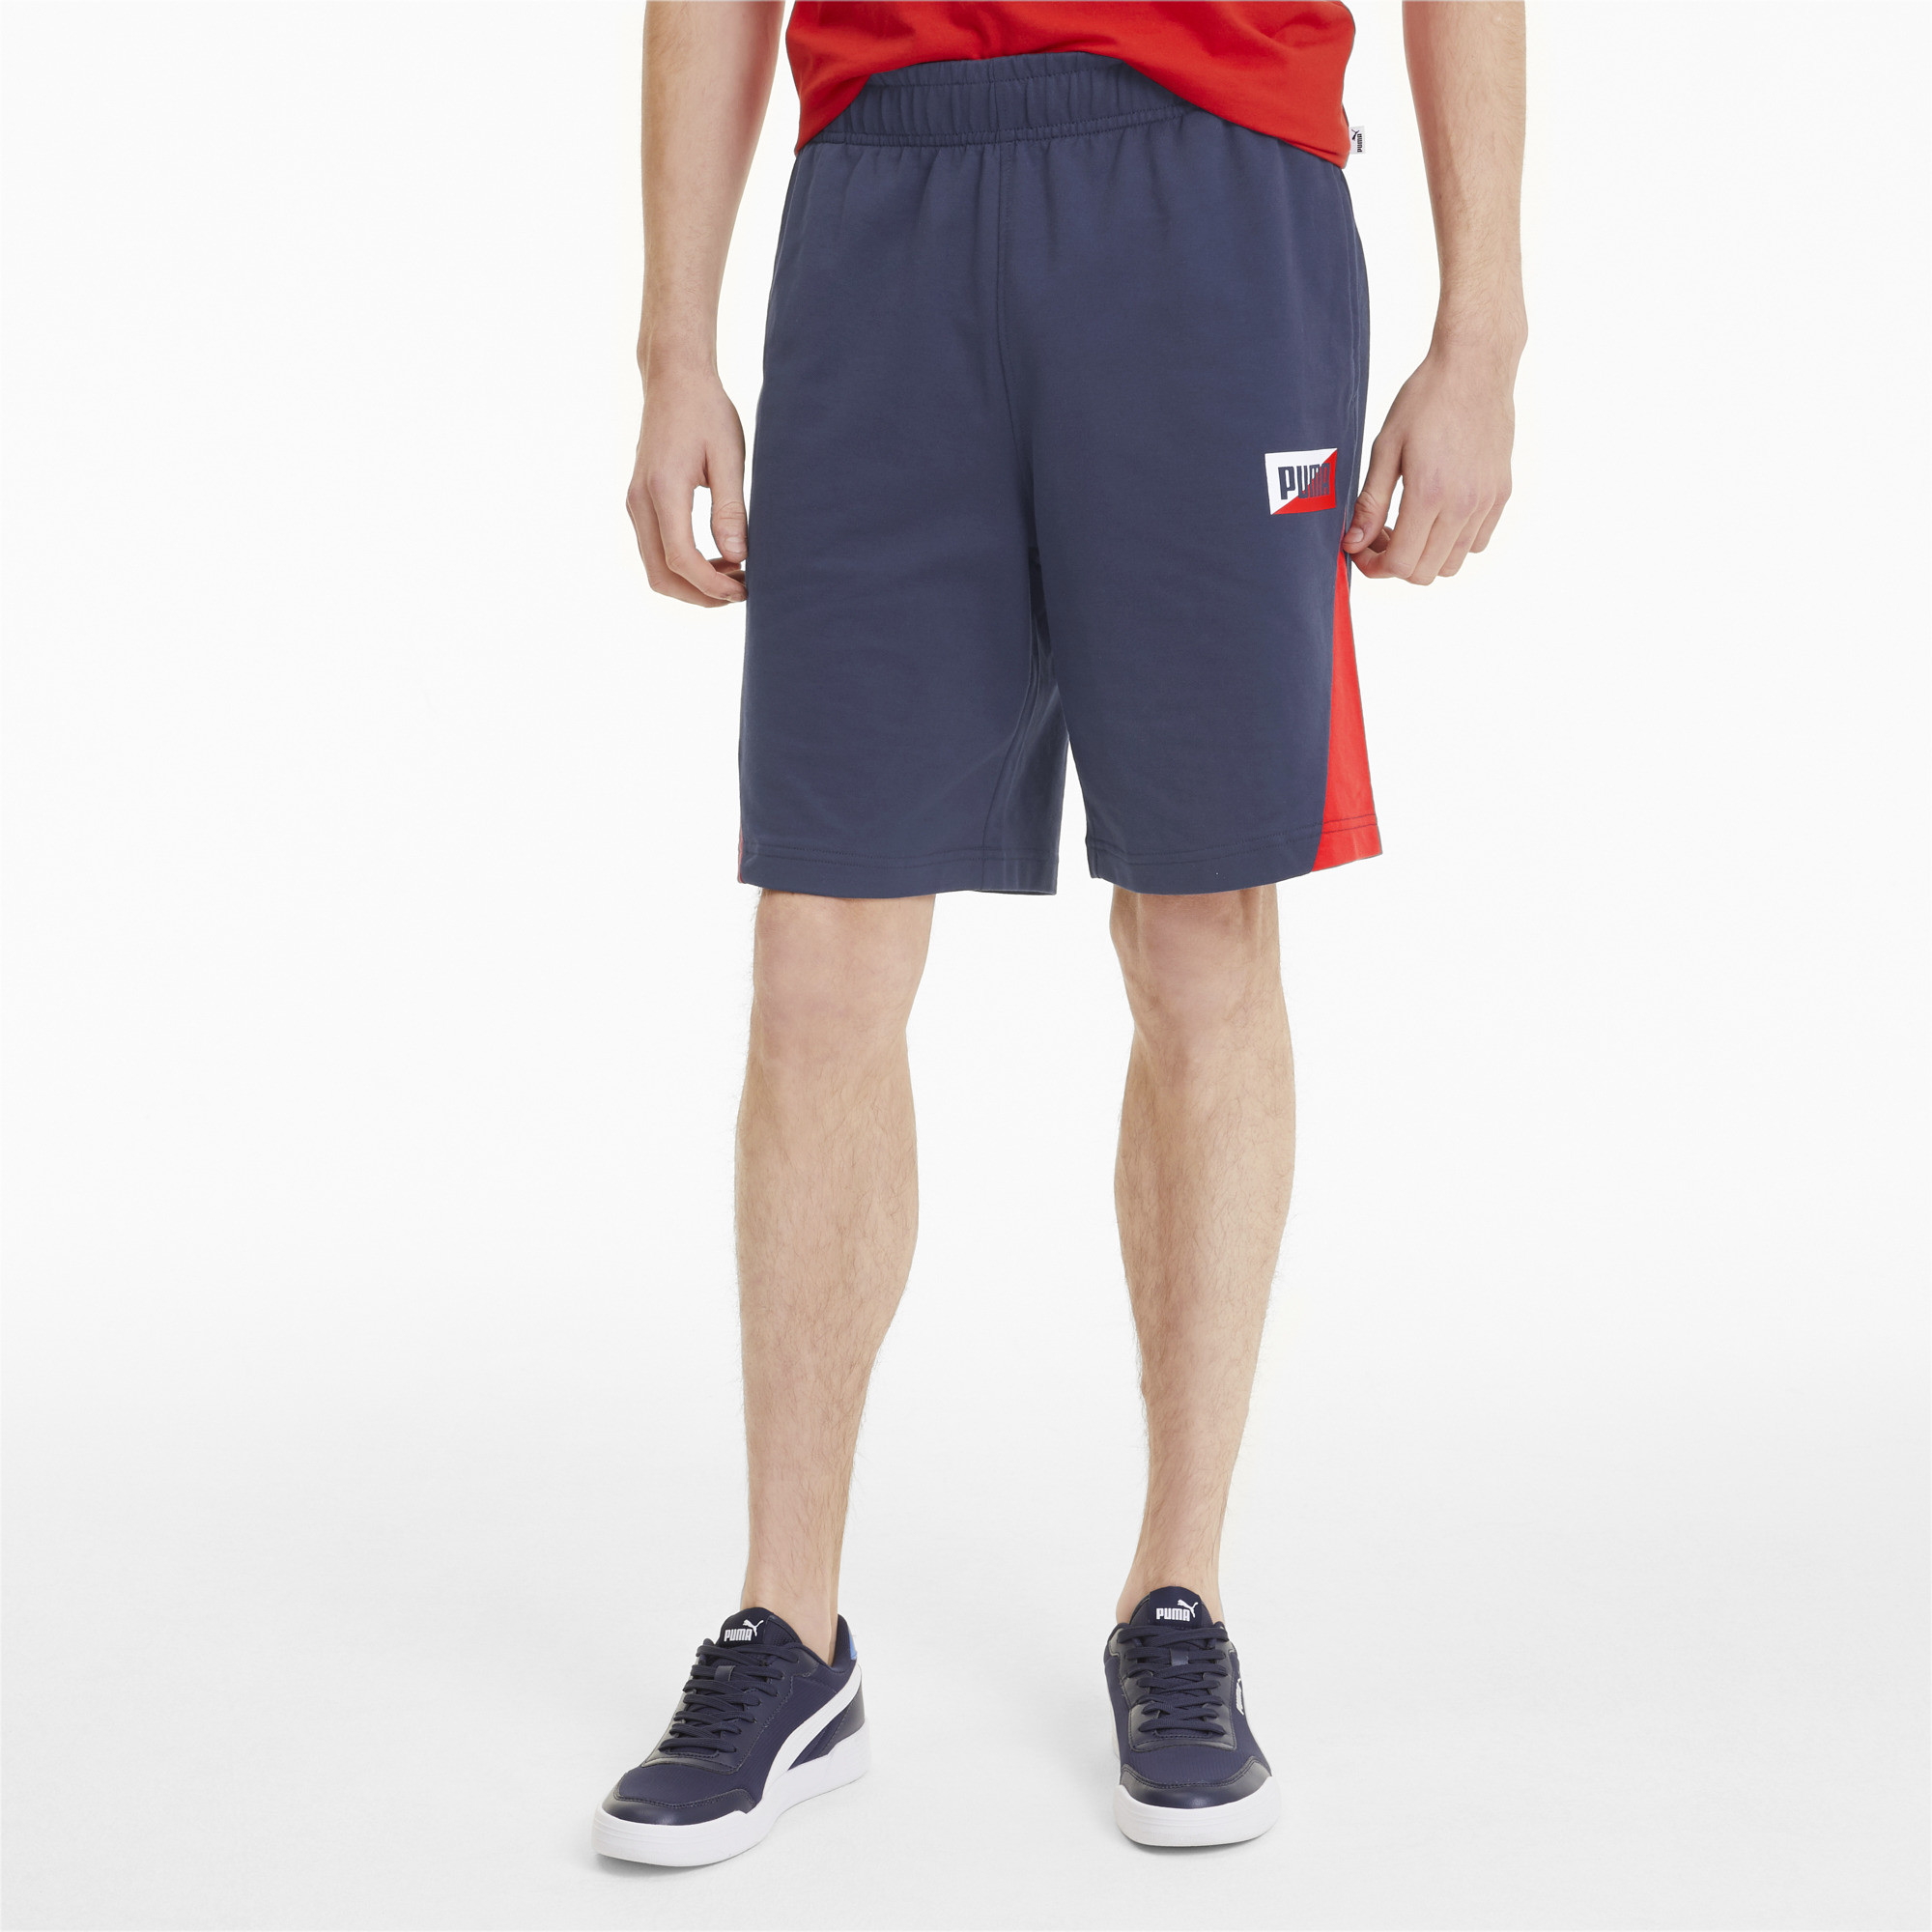 PUMA-Summer-Print-Men-039-s-Shorts-Men-Knitted-Shorts-Basics thumbnail 4